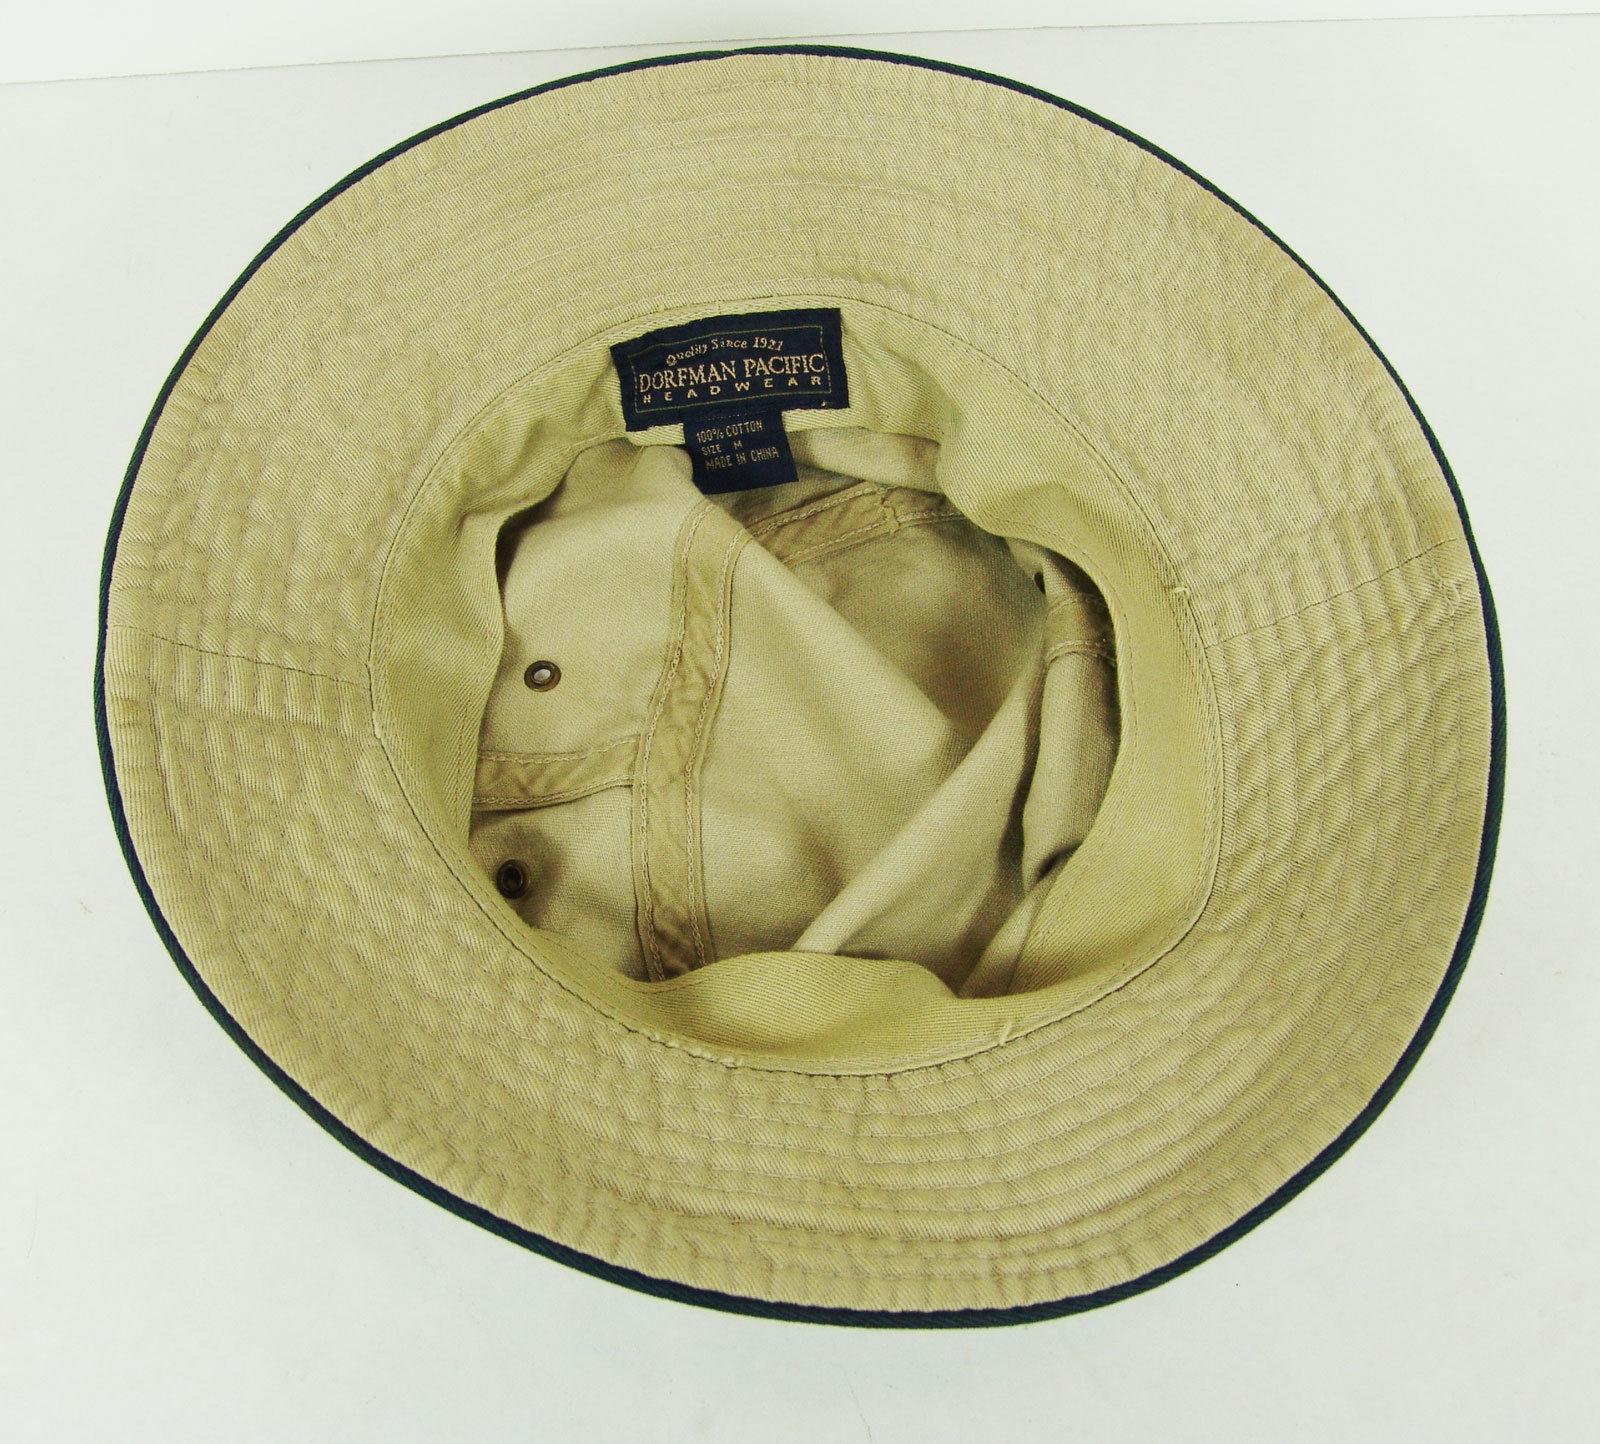 Dorfman Pacific Khaki Bucket Hat Size M 100% Cotton Packable Summer Sun  Outdoor e2fb26368eb2